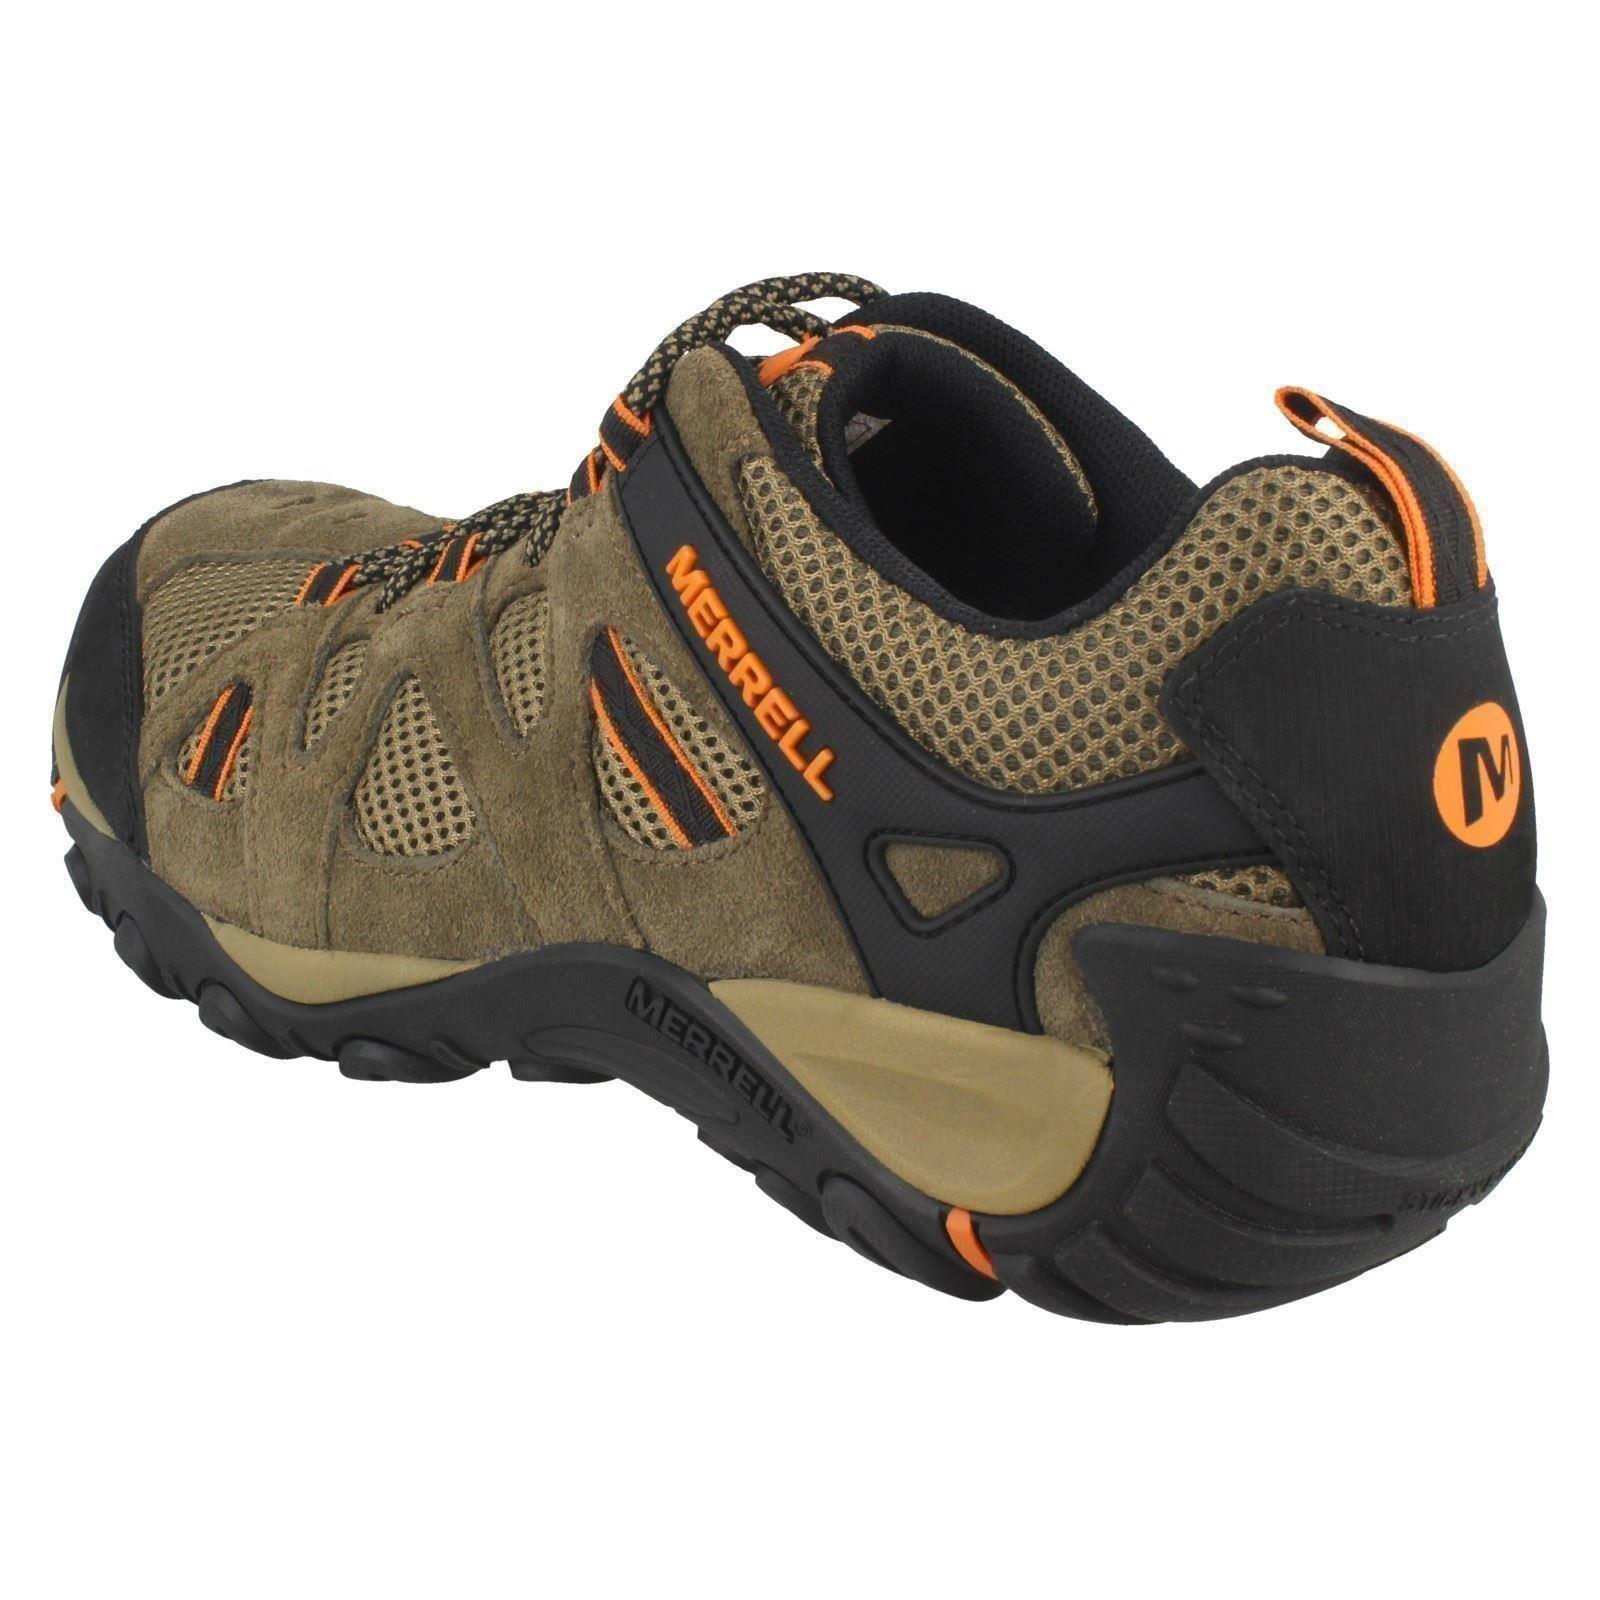 Lace Arancione b J343718c passeggio Merrell da pelle scarpe Yokota Ascender Mens Casual in Up Cantine Vent marrone ZnBx1q1RwE